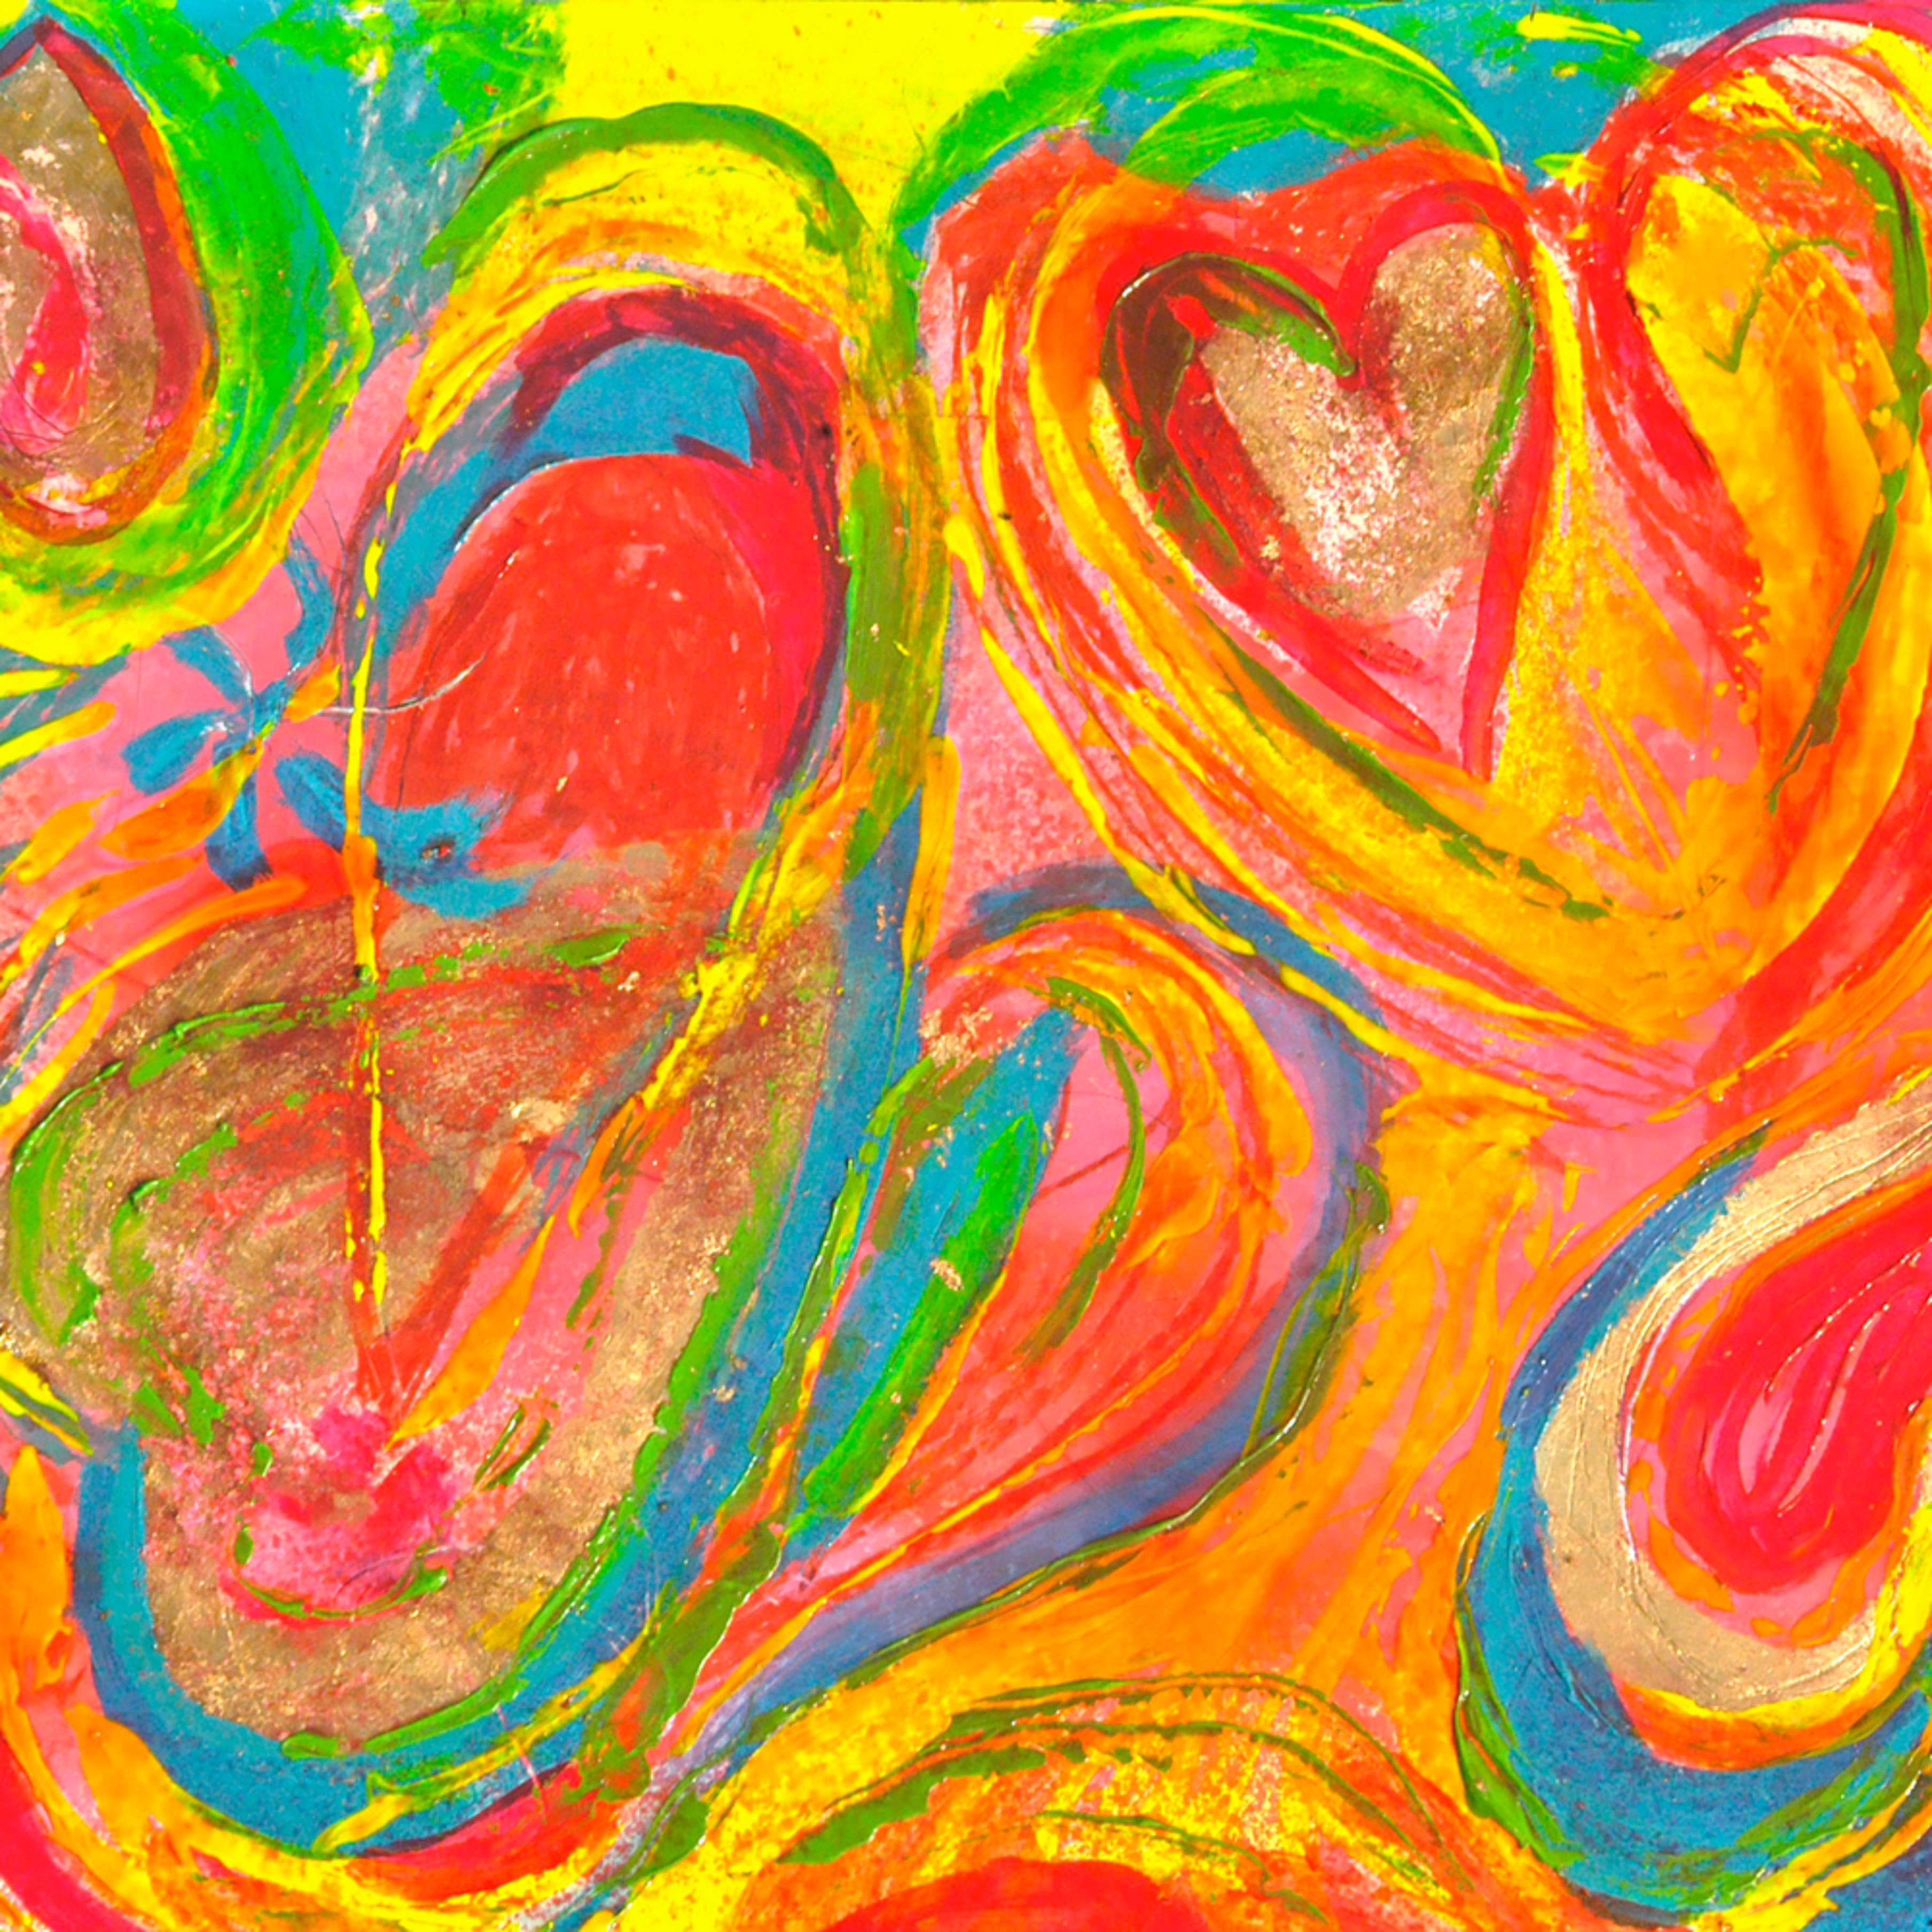 Heart 3 py8fak